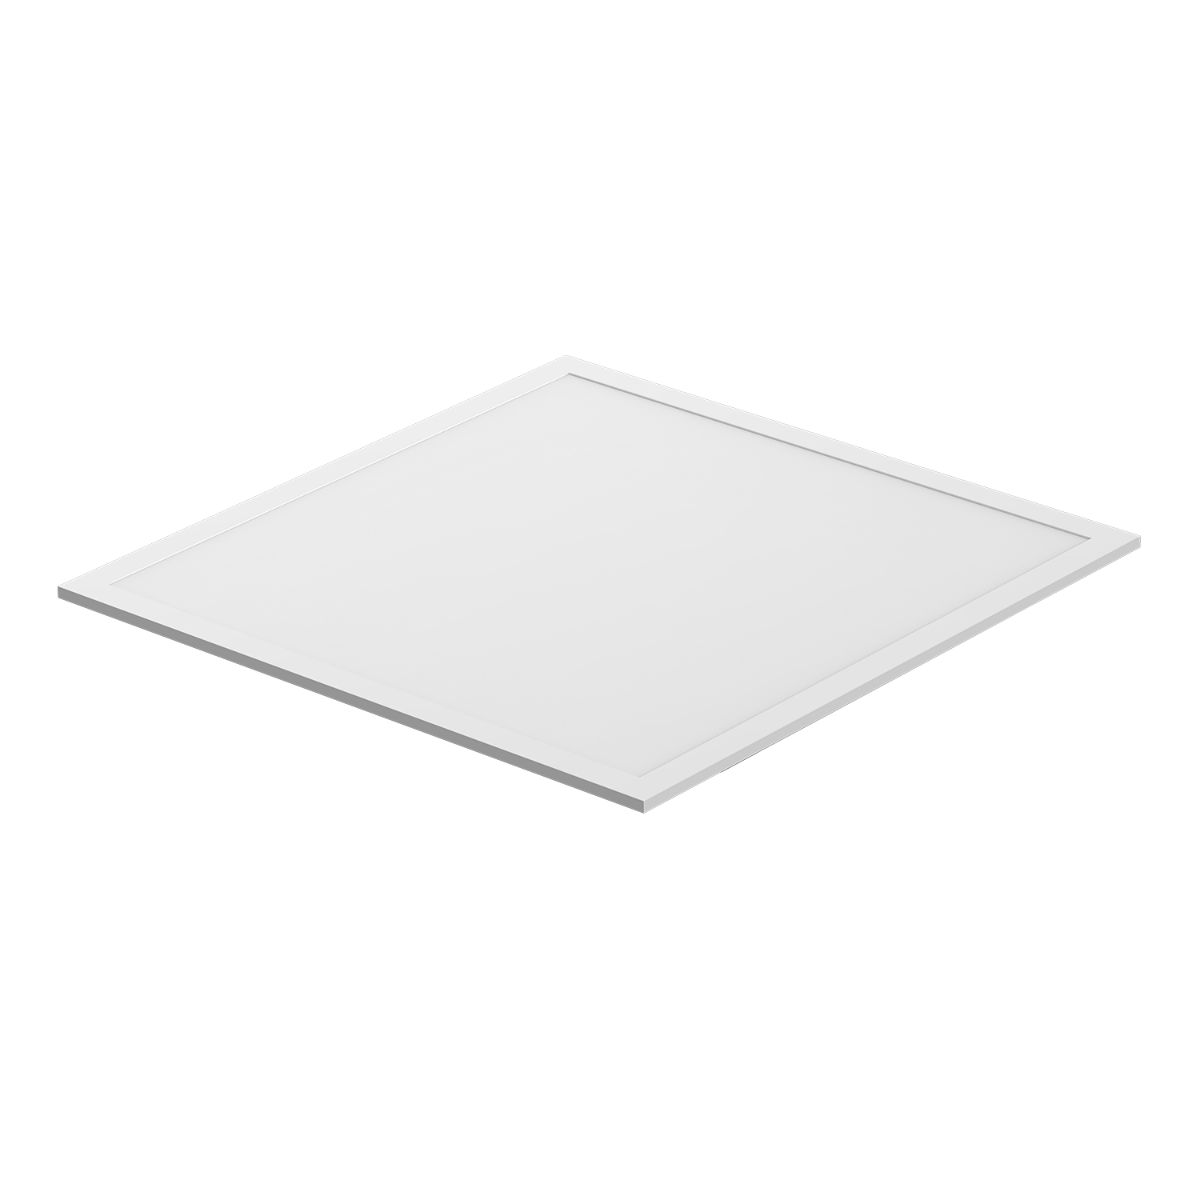 Noxion LED panel Econox 32W Xitanium DALI 60x60cm 3000K 3900lm UGR <22 | Dali dimbar - varm hvit - erstatter 4x18W